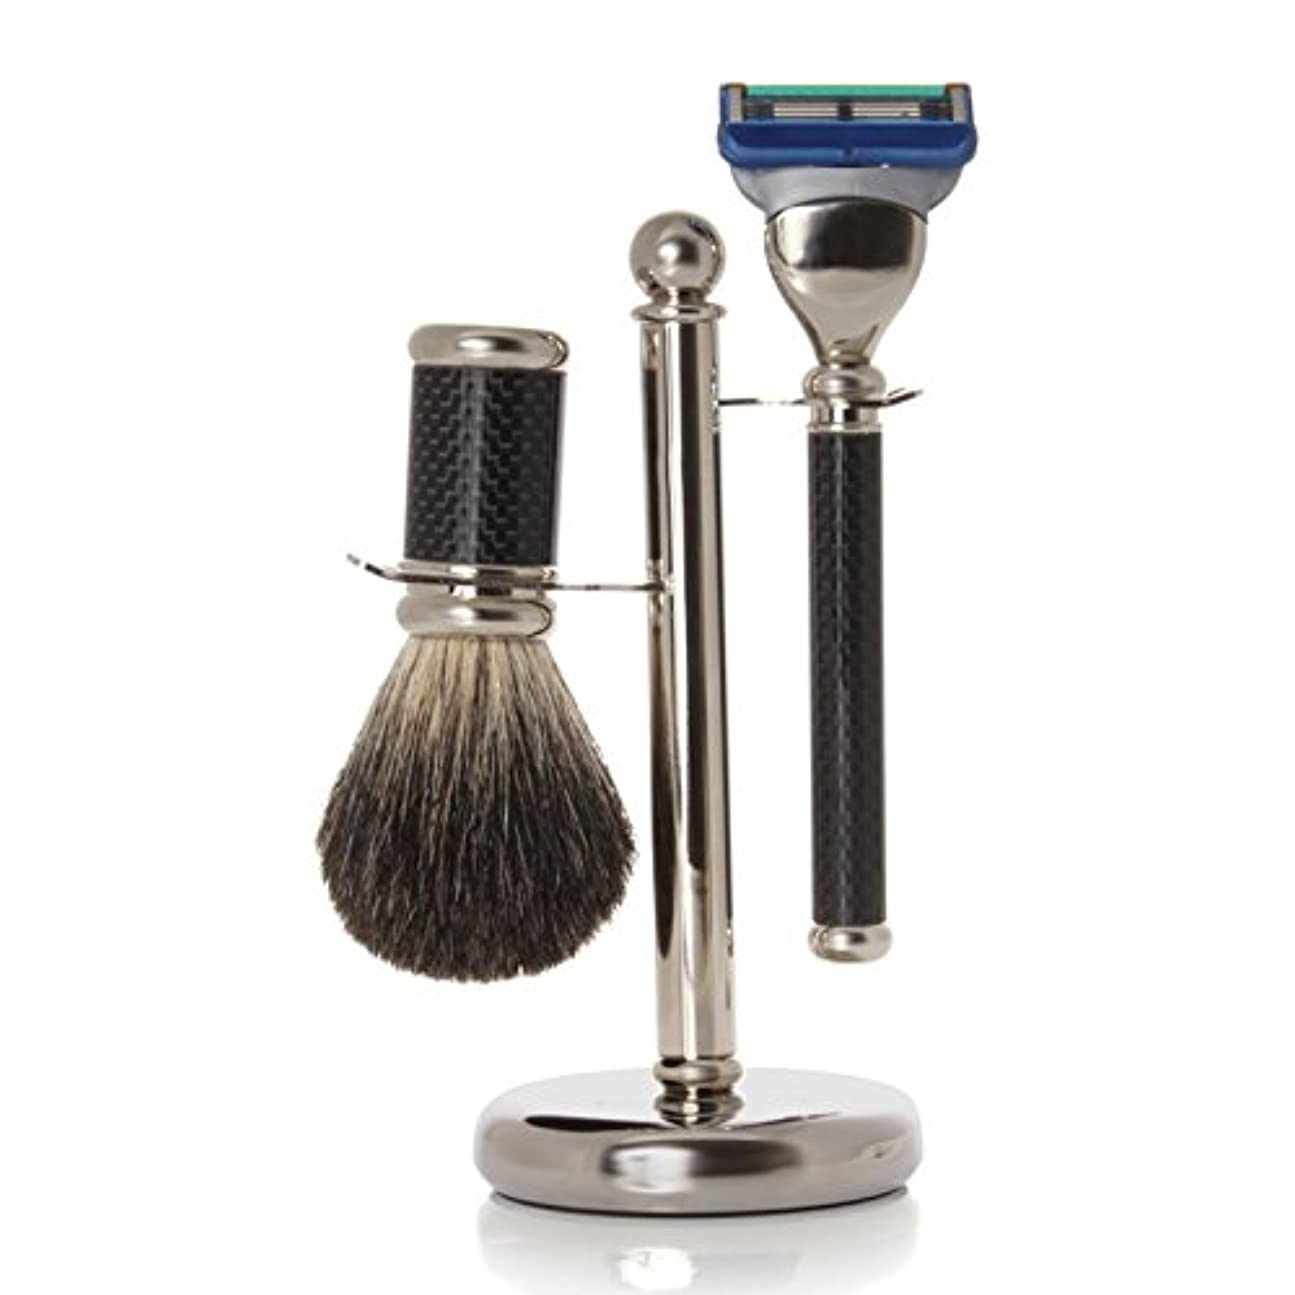 GOLDDACHS Shaving Set, Fusion, 100% badger hair, Carbon